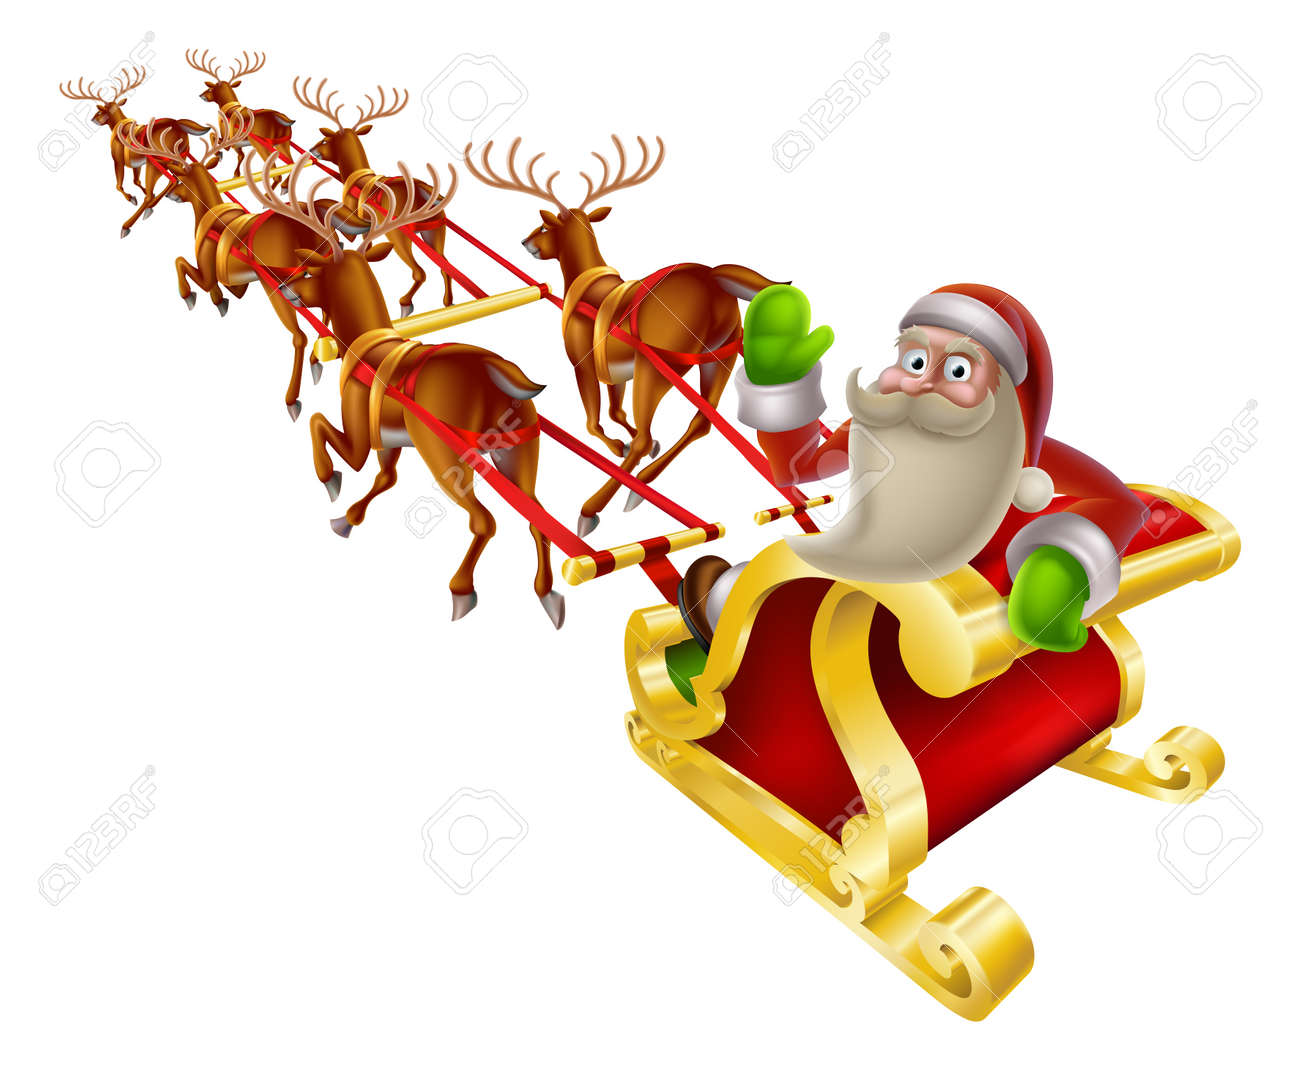 Cartoon Santa in his Christmas sleigh waving back at the viewer Stock Vector - 23662251